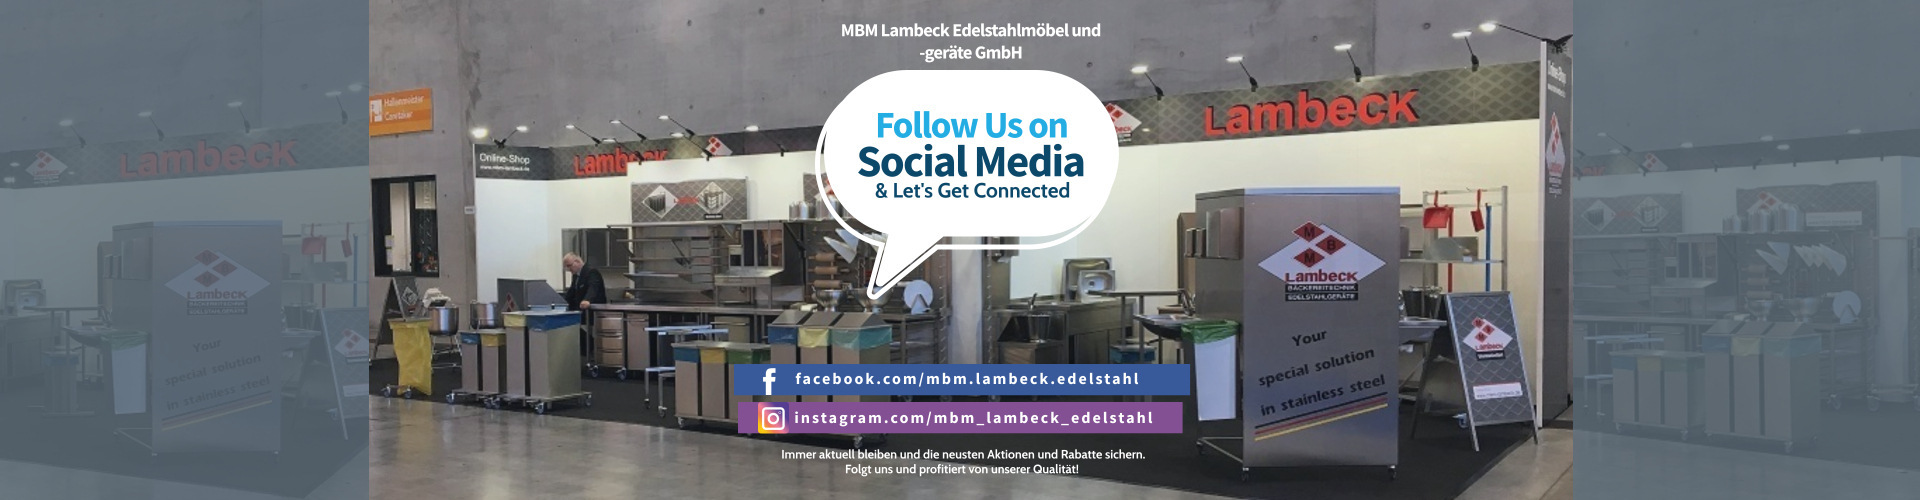 MBM Lambeck Social media